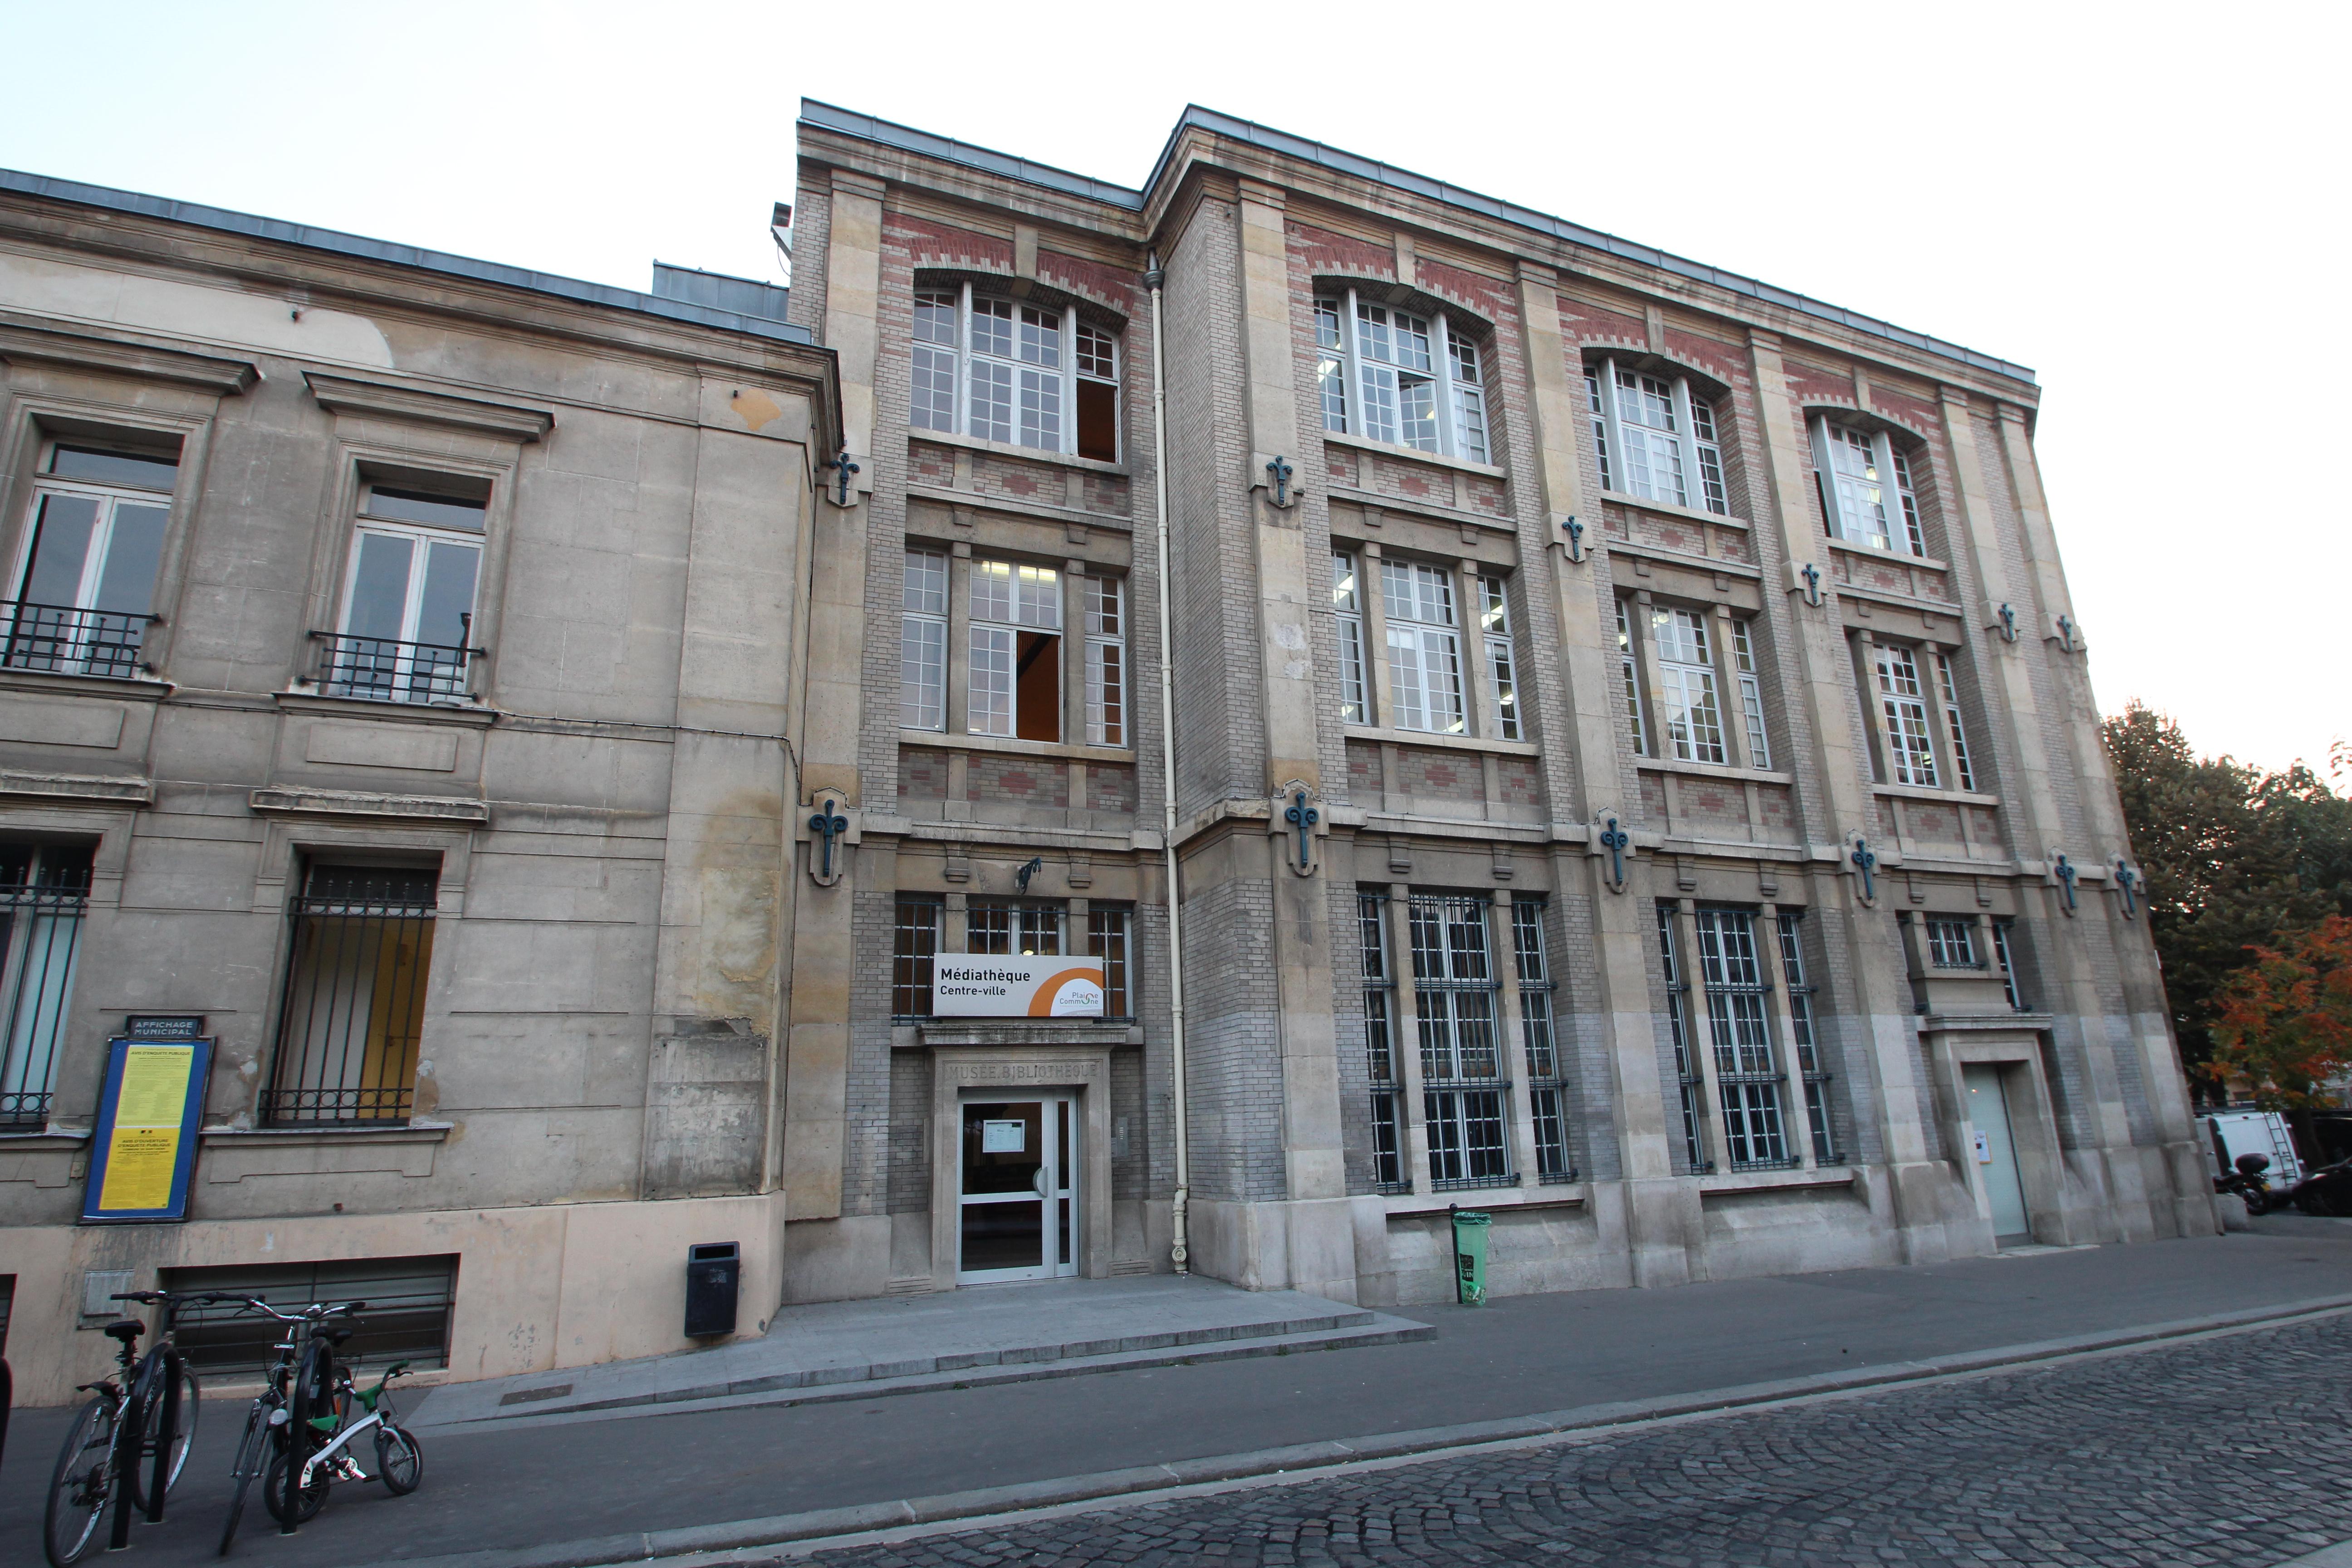 M Ef Bf Bddiath Ef Bf Bdque De Saint Denis Centre Ville